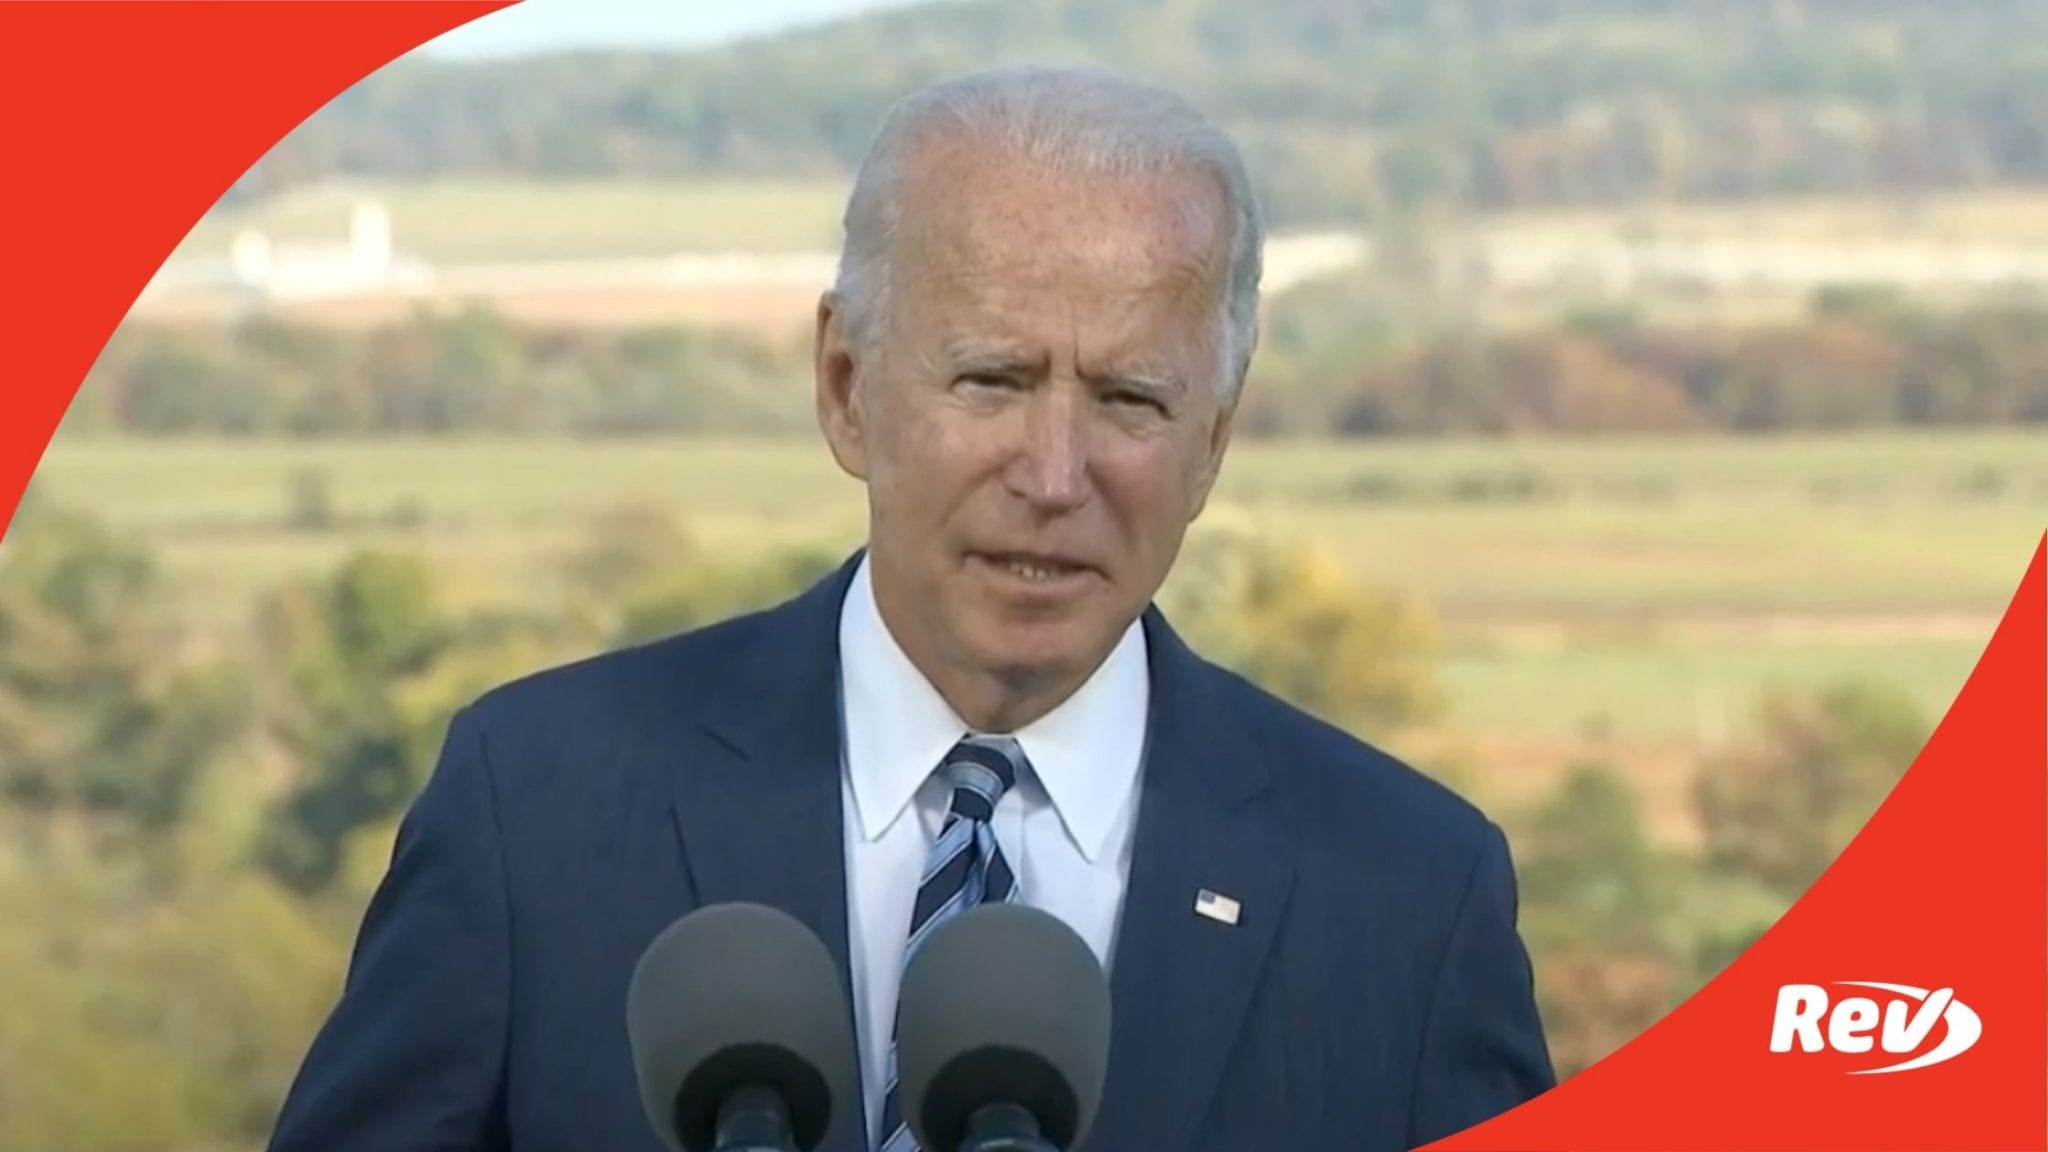 Joe Biden Gettysburg Campaign Speech Transcript October 6